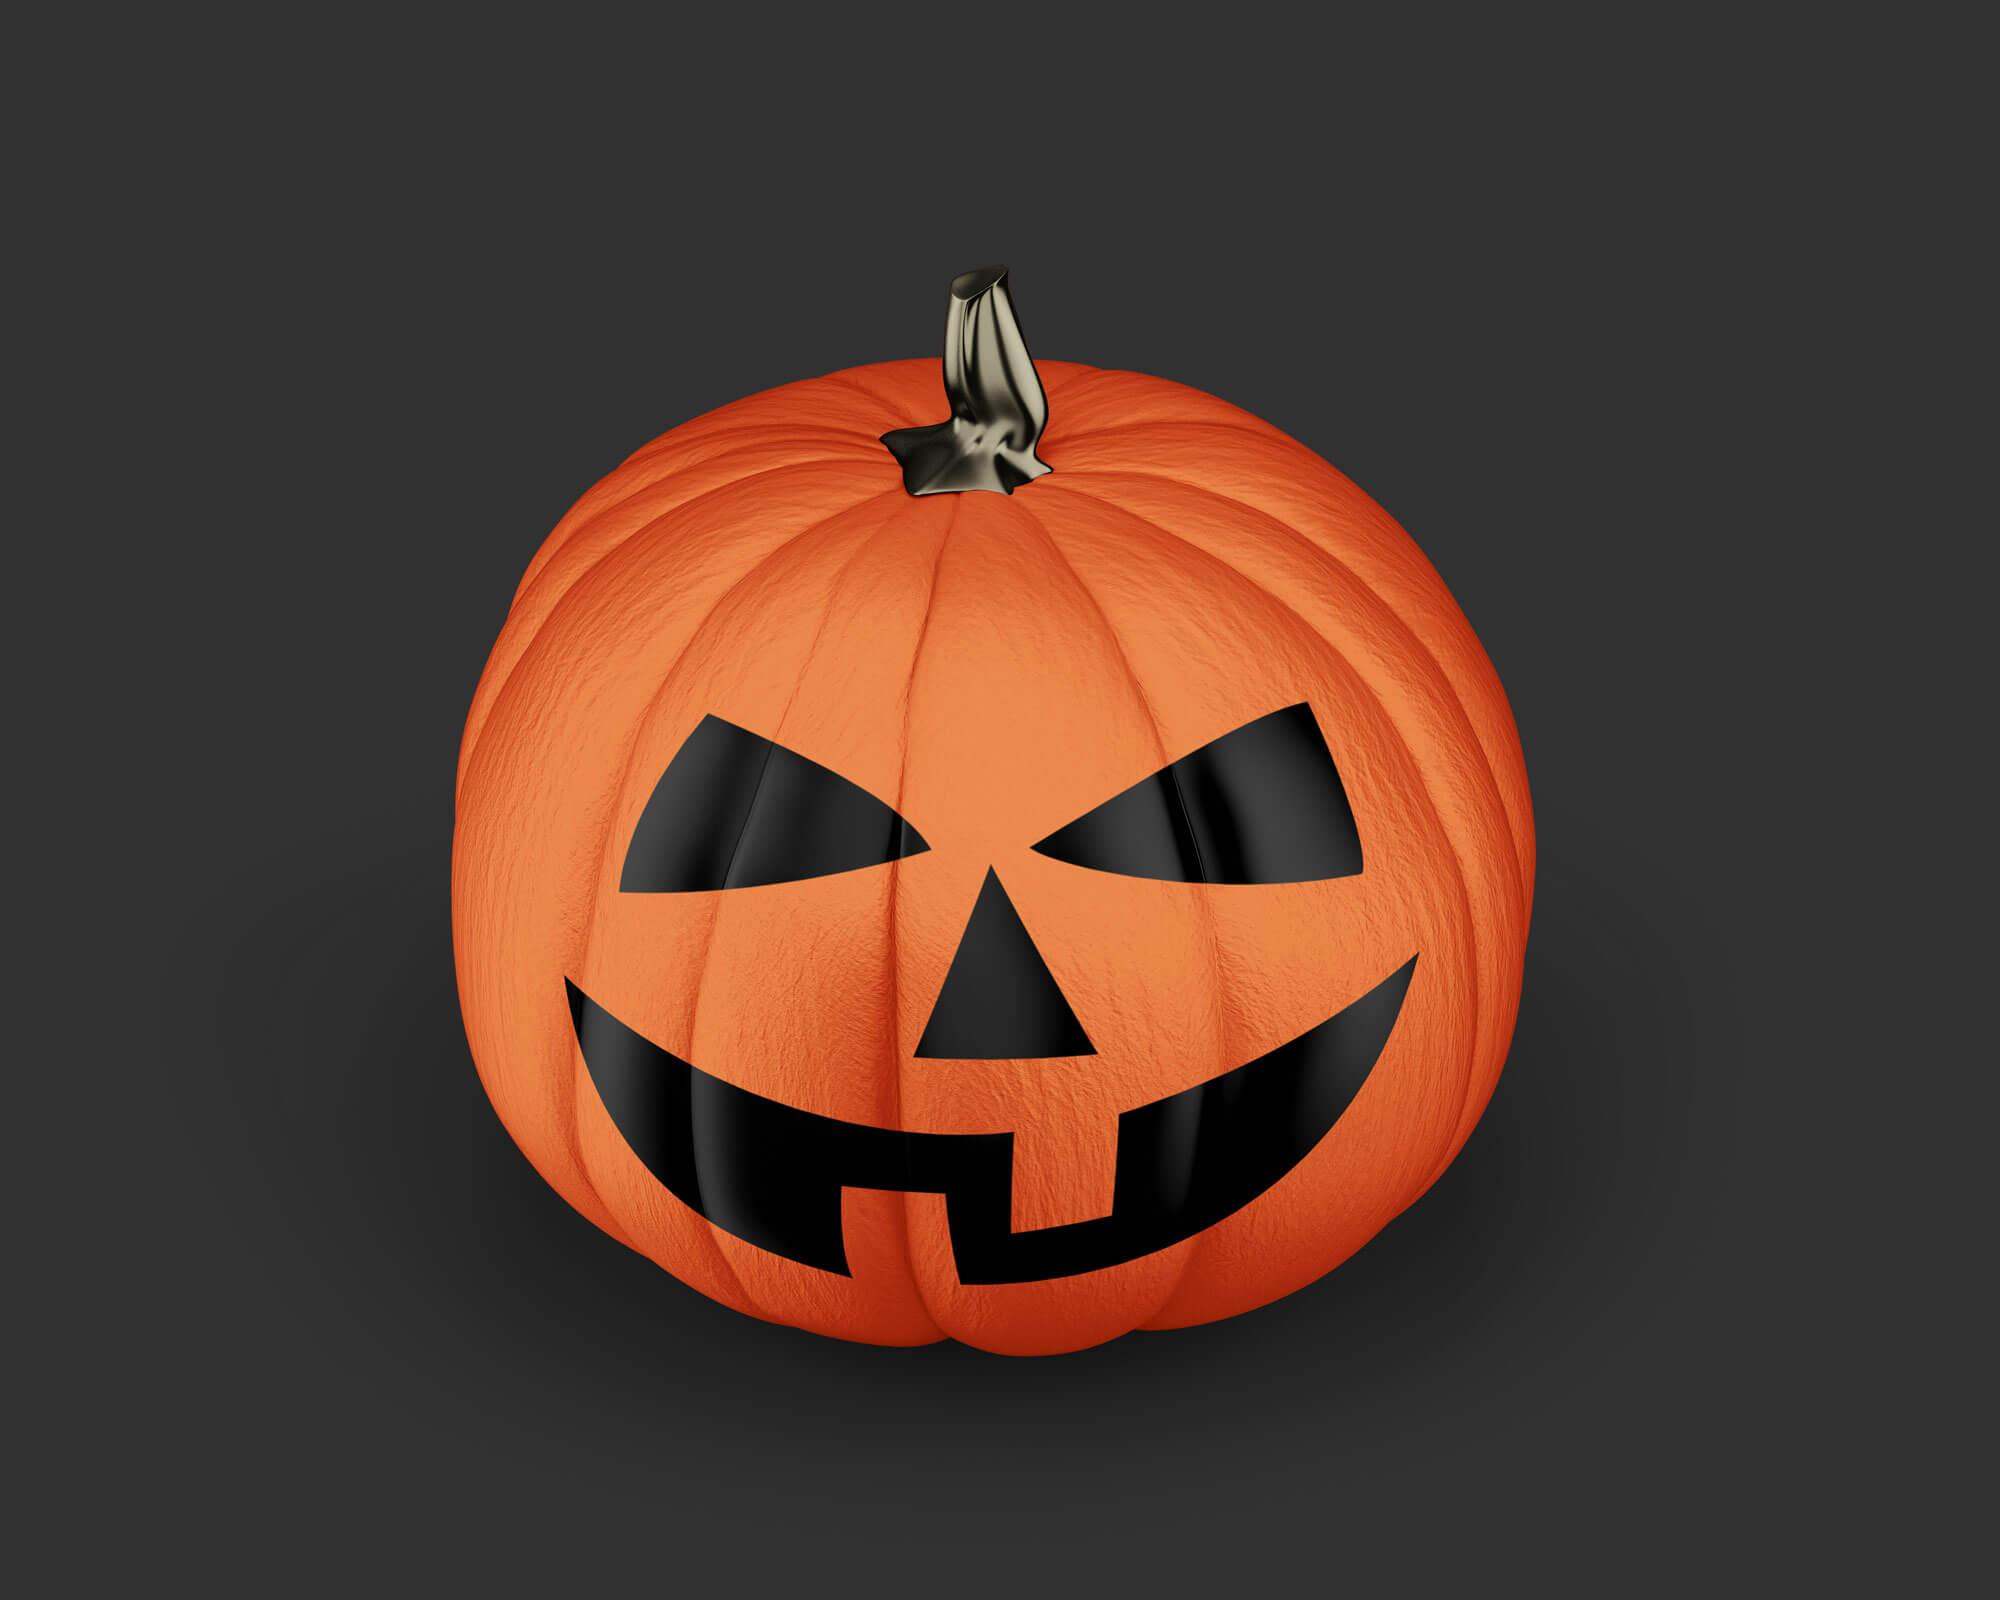 Free-Painted-Halloween-2020-Scary-Pumpkin-Mockup-PSD-2